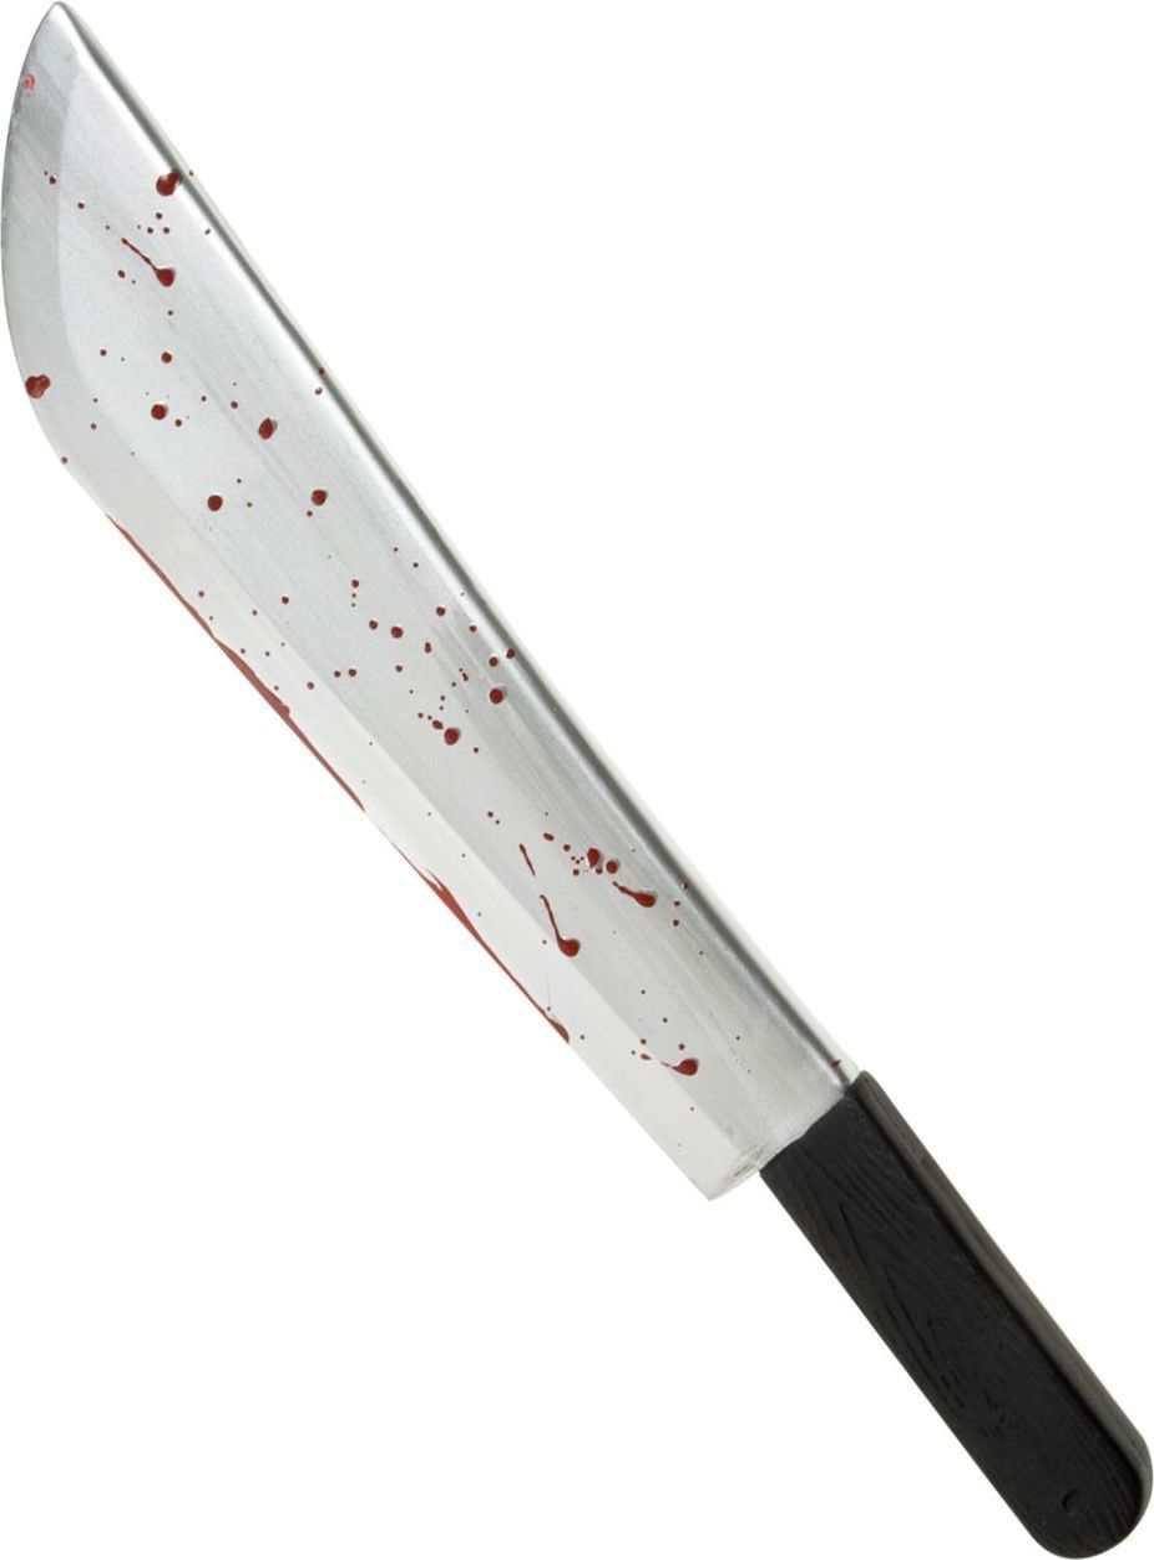 Bloederige machete